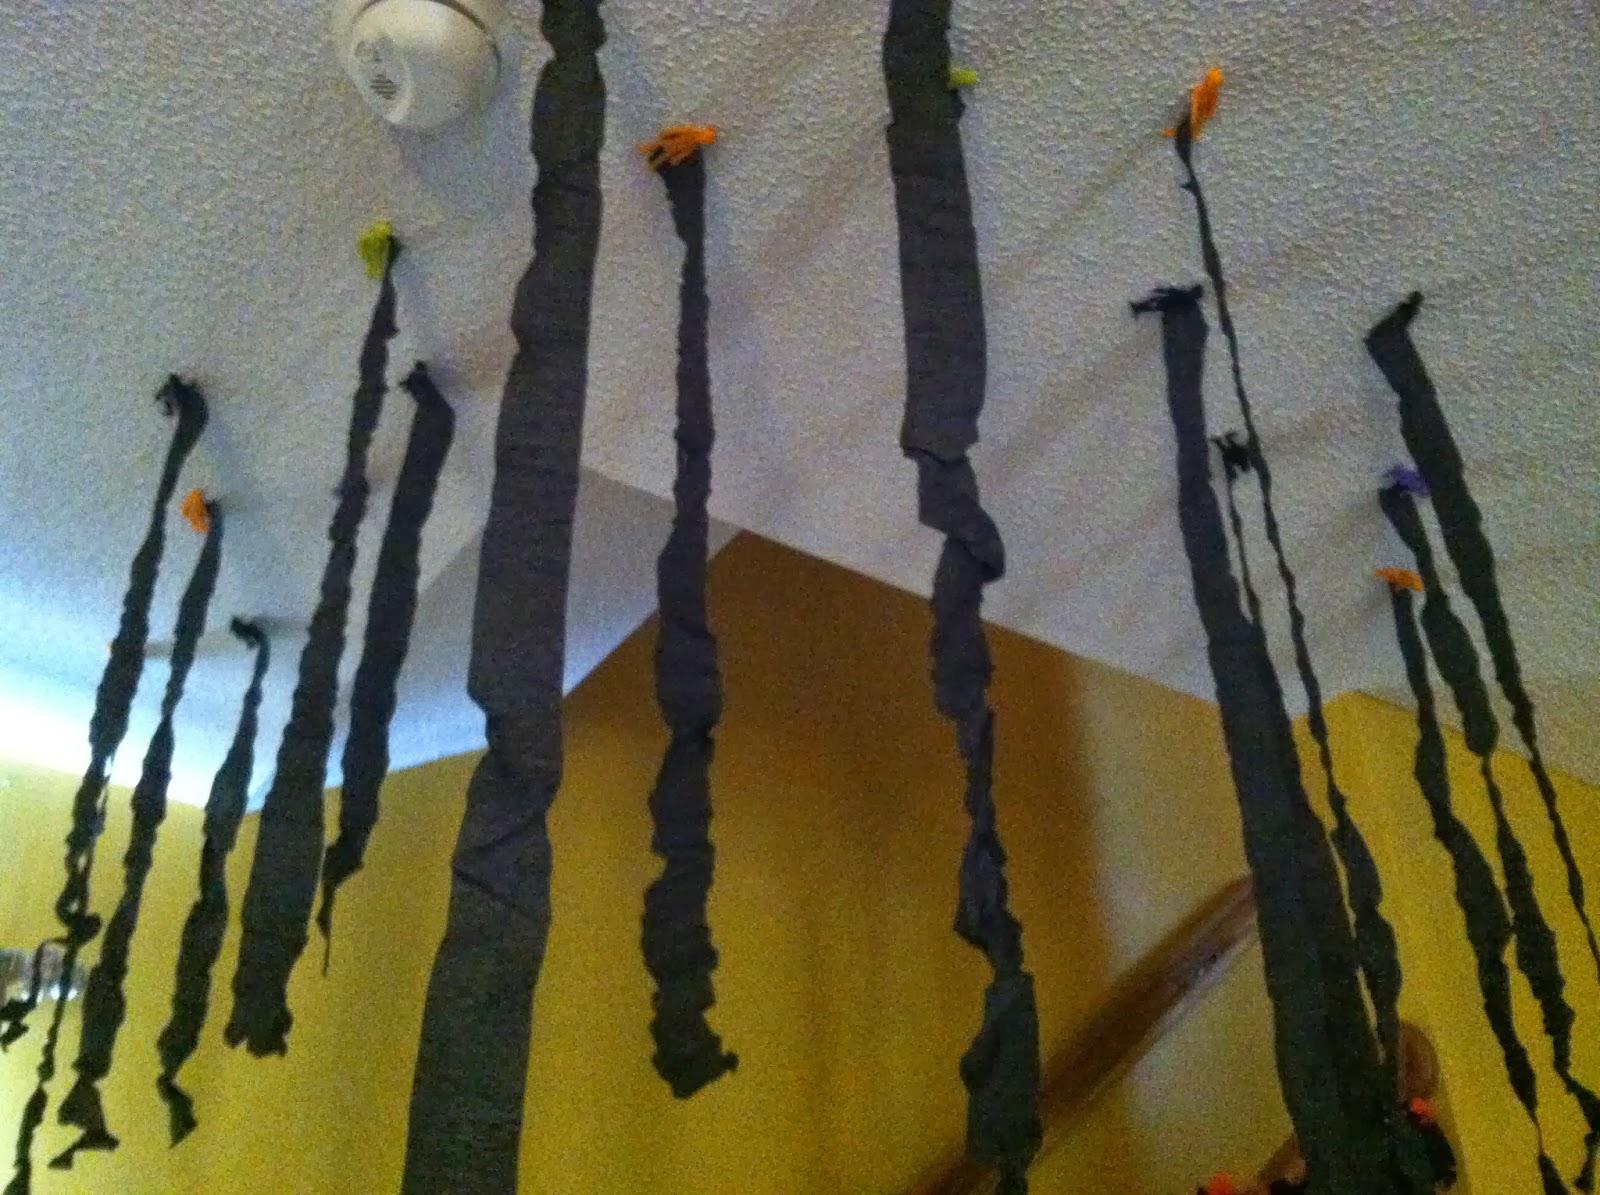 babyfingers halloween decorating diy spooky ceiling